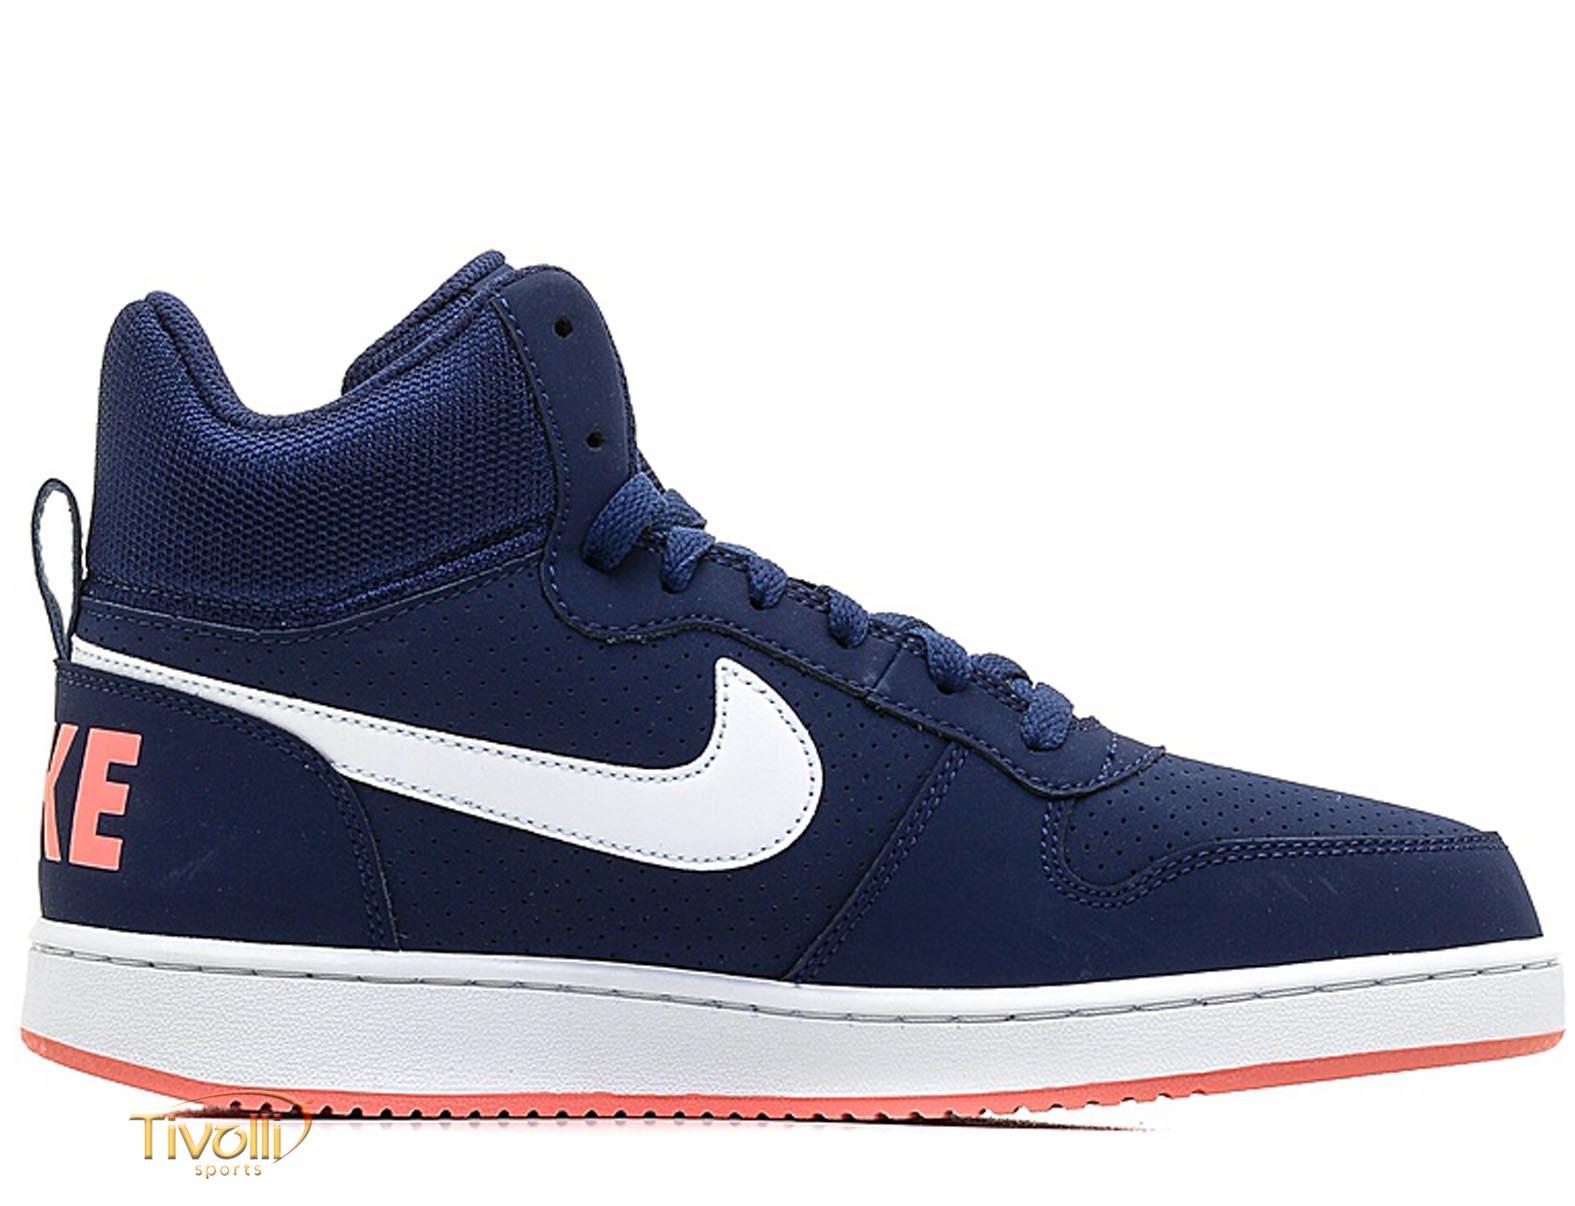 54470d6b81 Tênis Nike Court Borough Mid Cano Médio